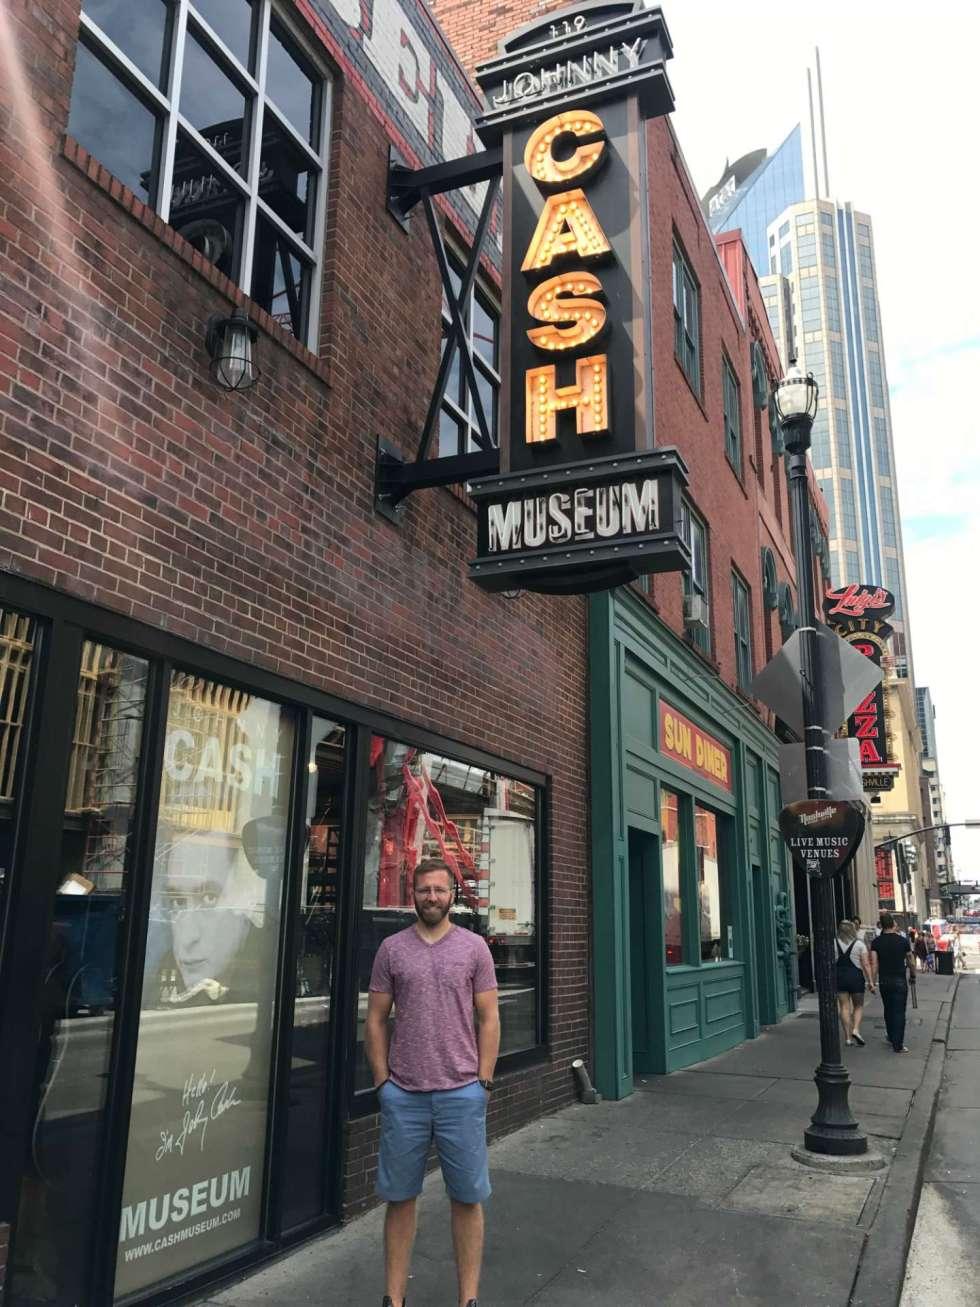 Nashville Travel Guide - I'm Fixin' To - @mbg0112